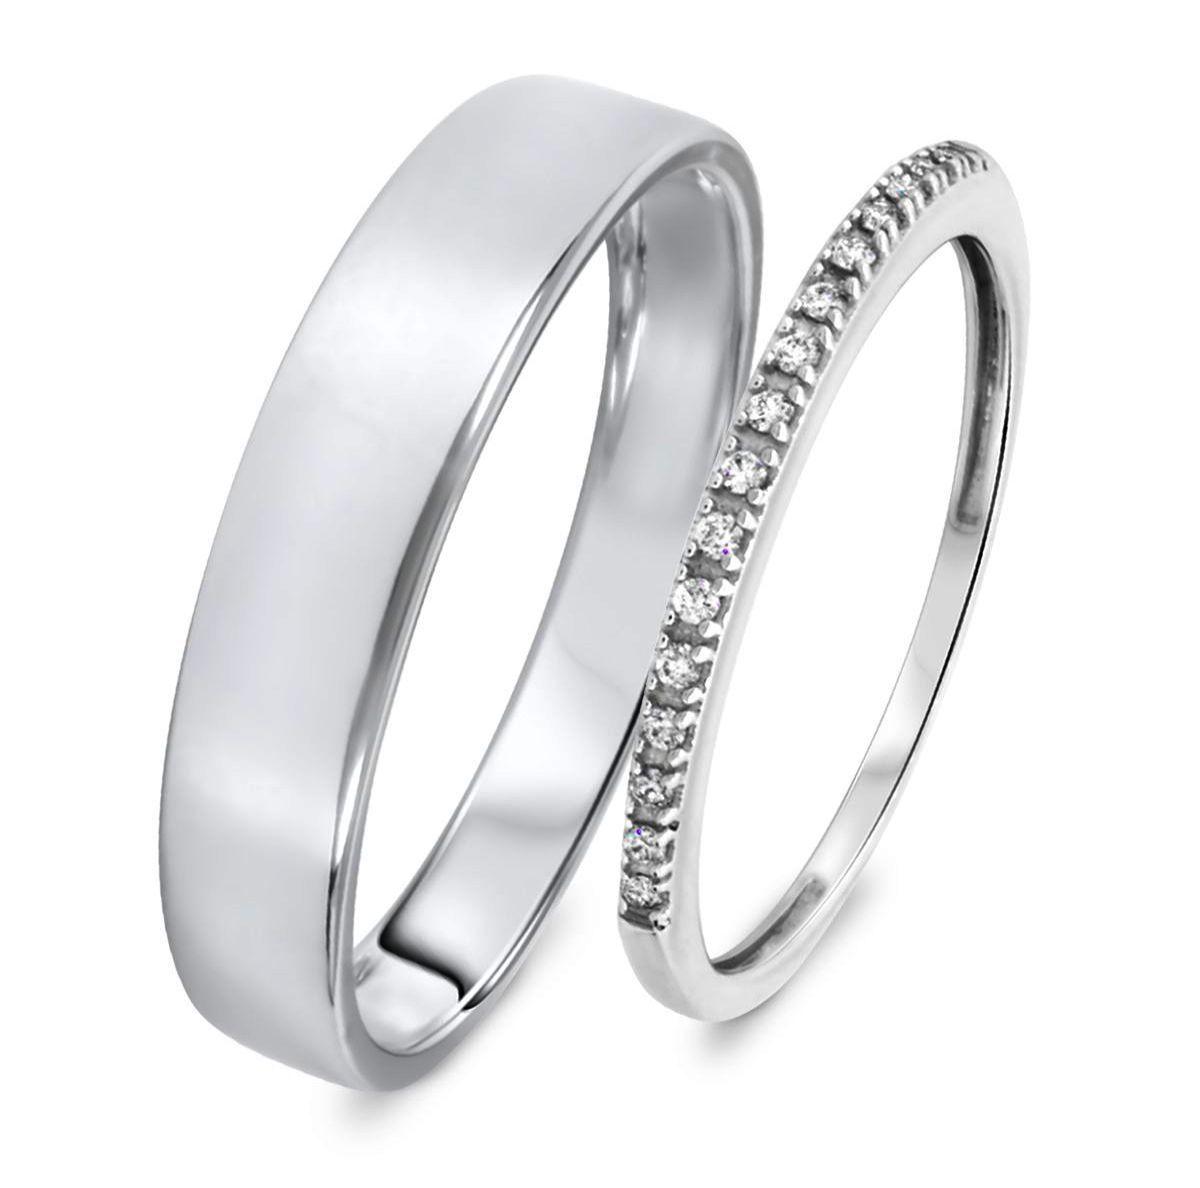 Marriage Ring Cartoon Wedding Bands Hq Coupon Cincin Aksesoris Perhiasan